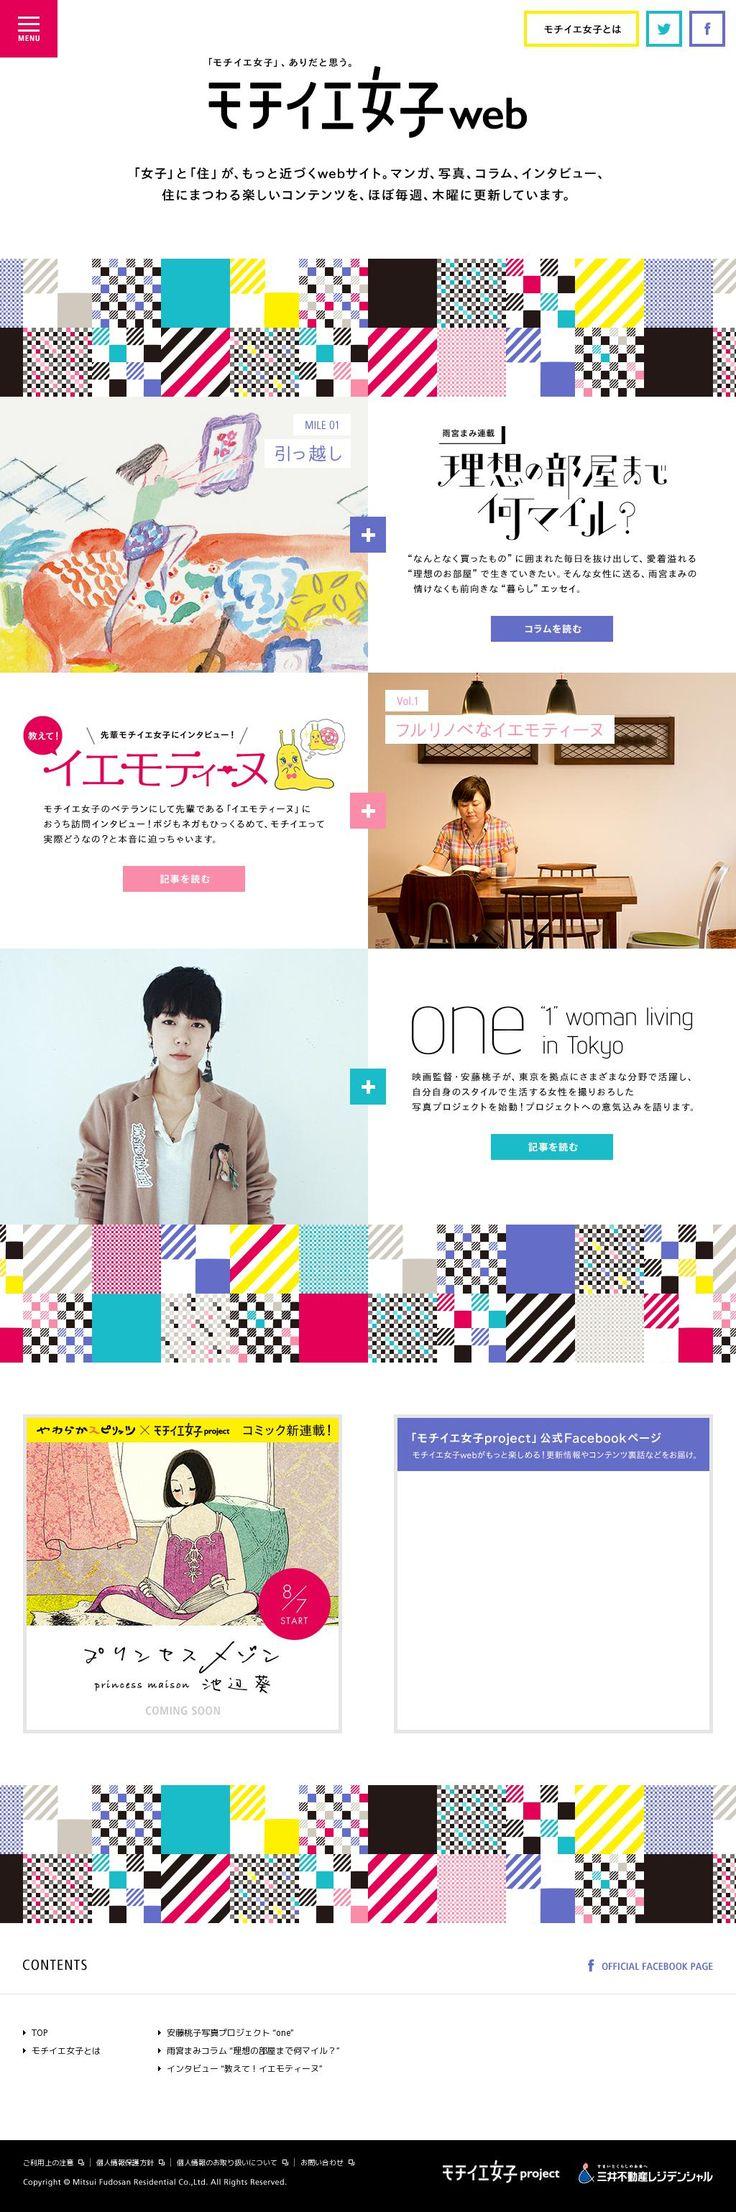 The website 'http://www.mochiiejoshi.com/mj/' courtesy of @Pinstamatic (http://pinstamatic.com)